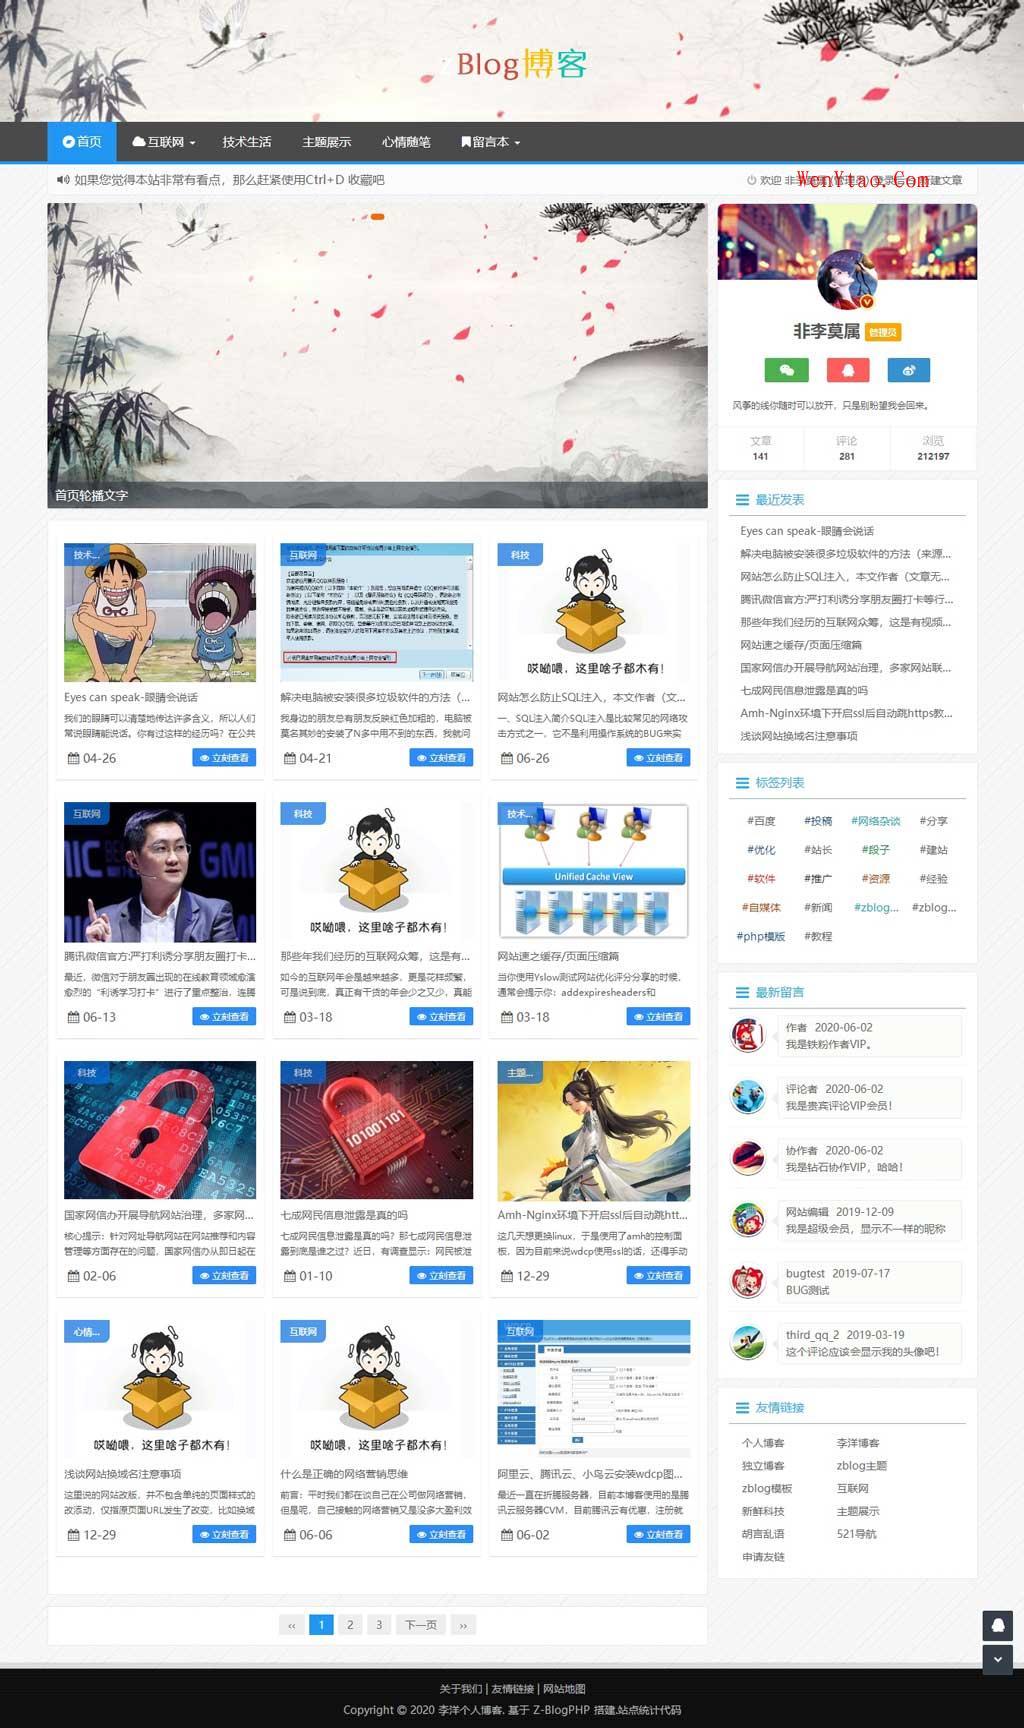 zblog主题模板,水墨年华(filmslee),VIP会员免费下载 第2张